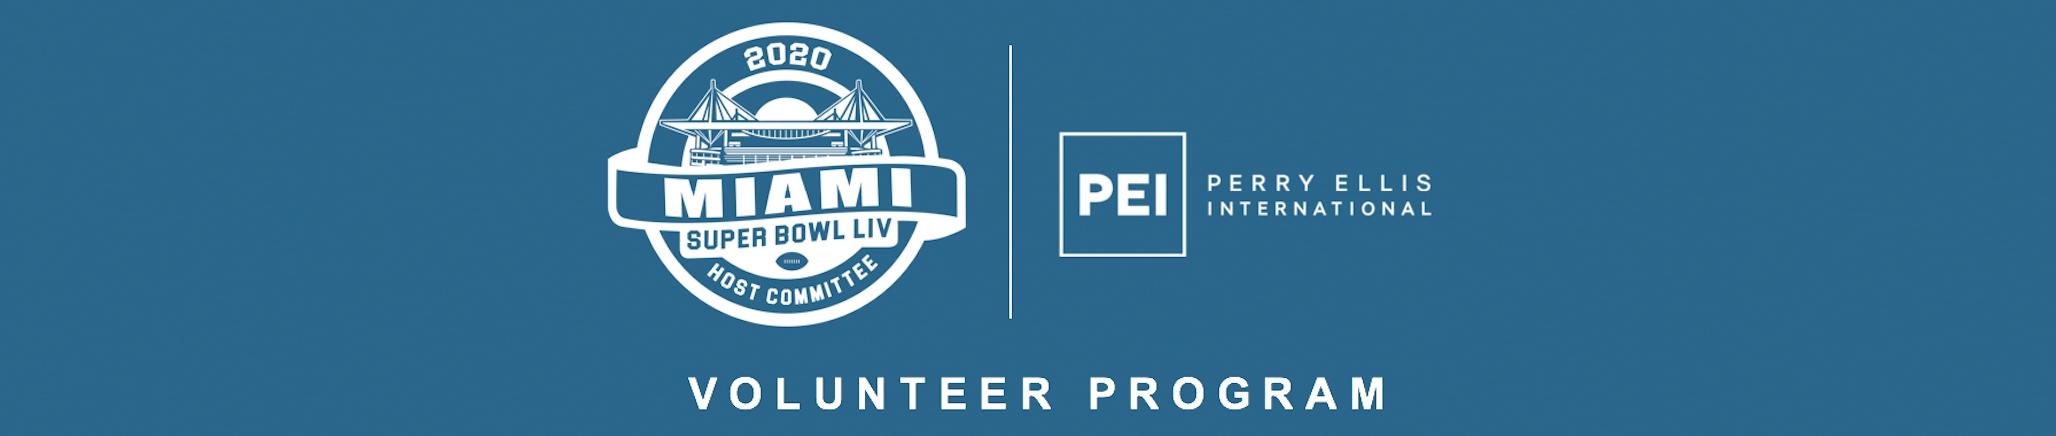 Miami Super Bowl Volunteer Program   Register regarding Volunteer For Miami Super Bowl